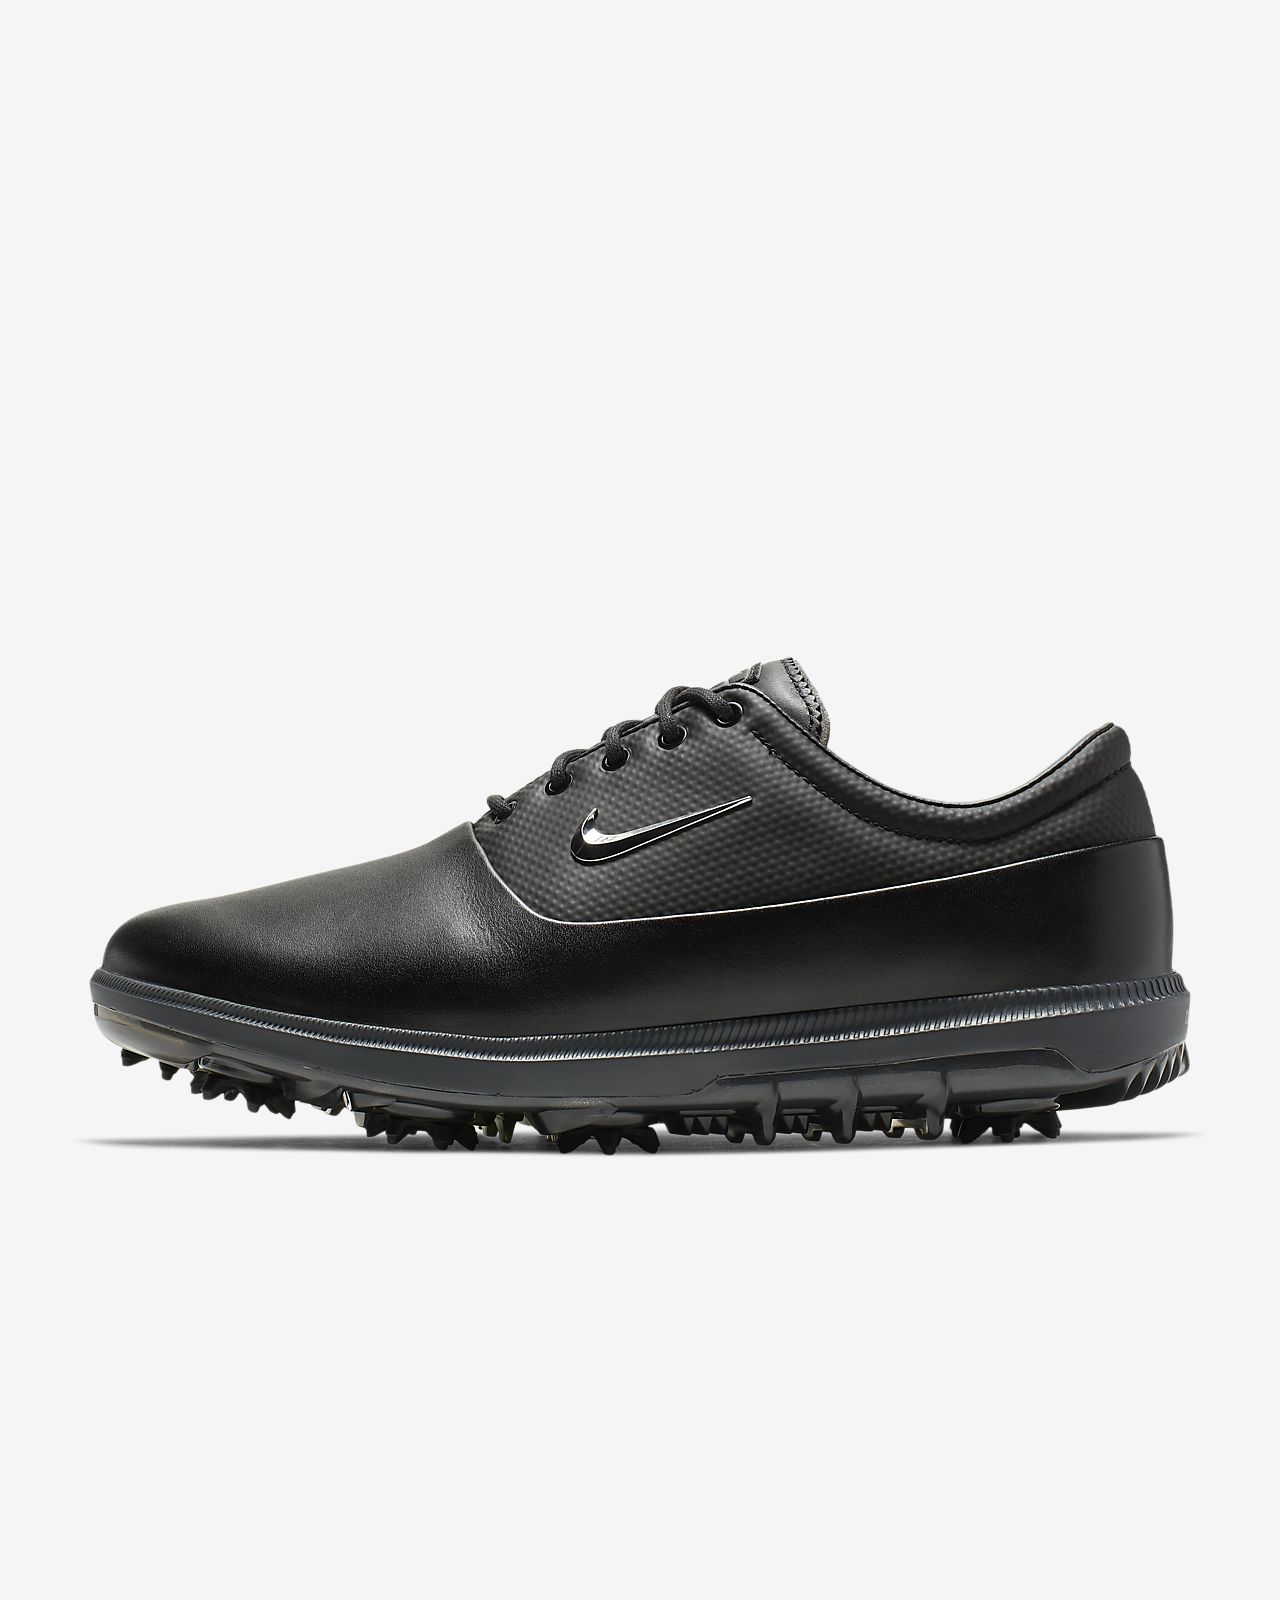 b31b02c1180 Chaussure de golf Nike Air Zoom Victory Tour pour Homme. Nike.com CA